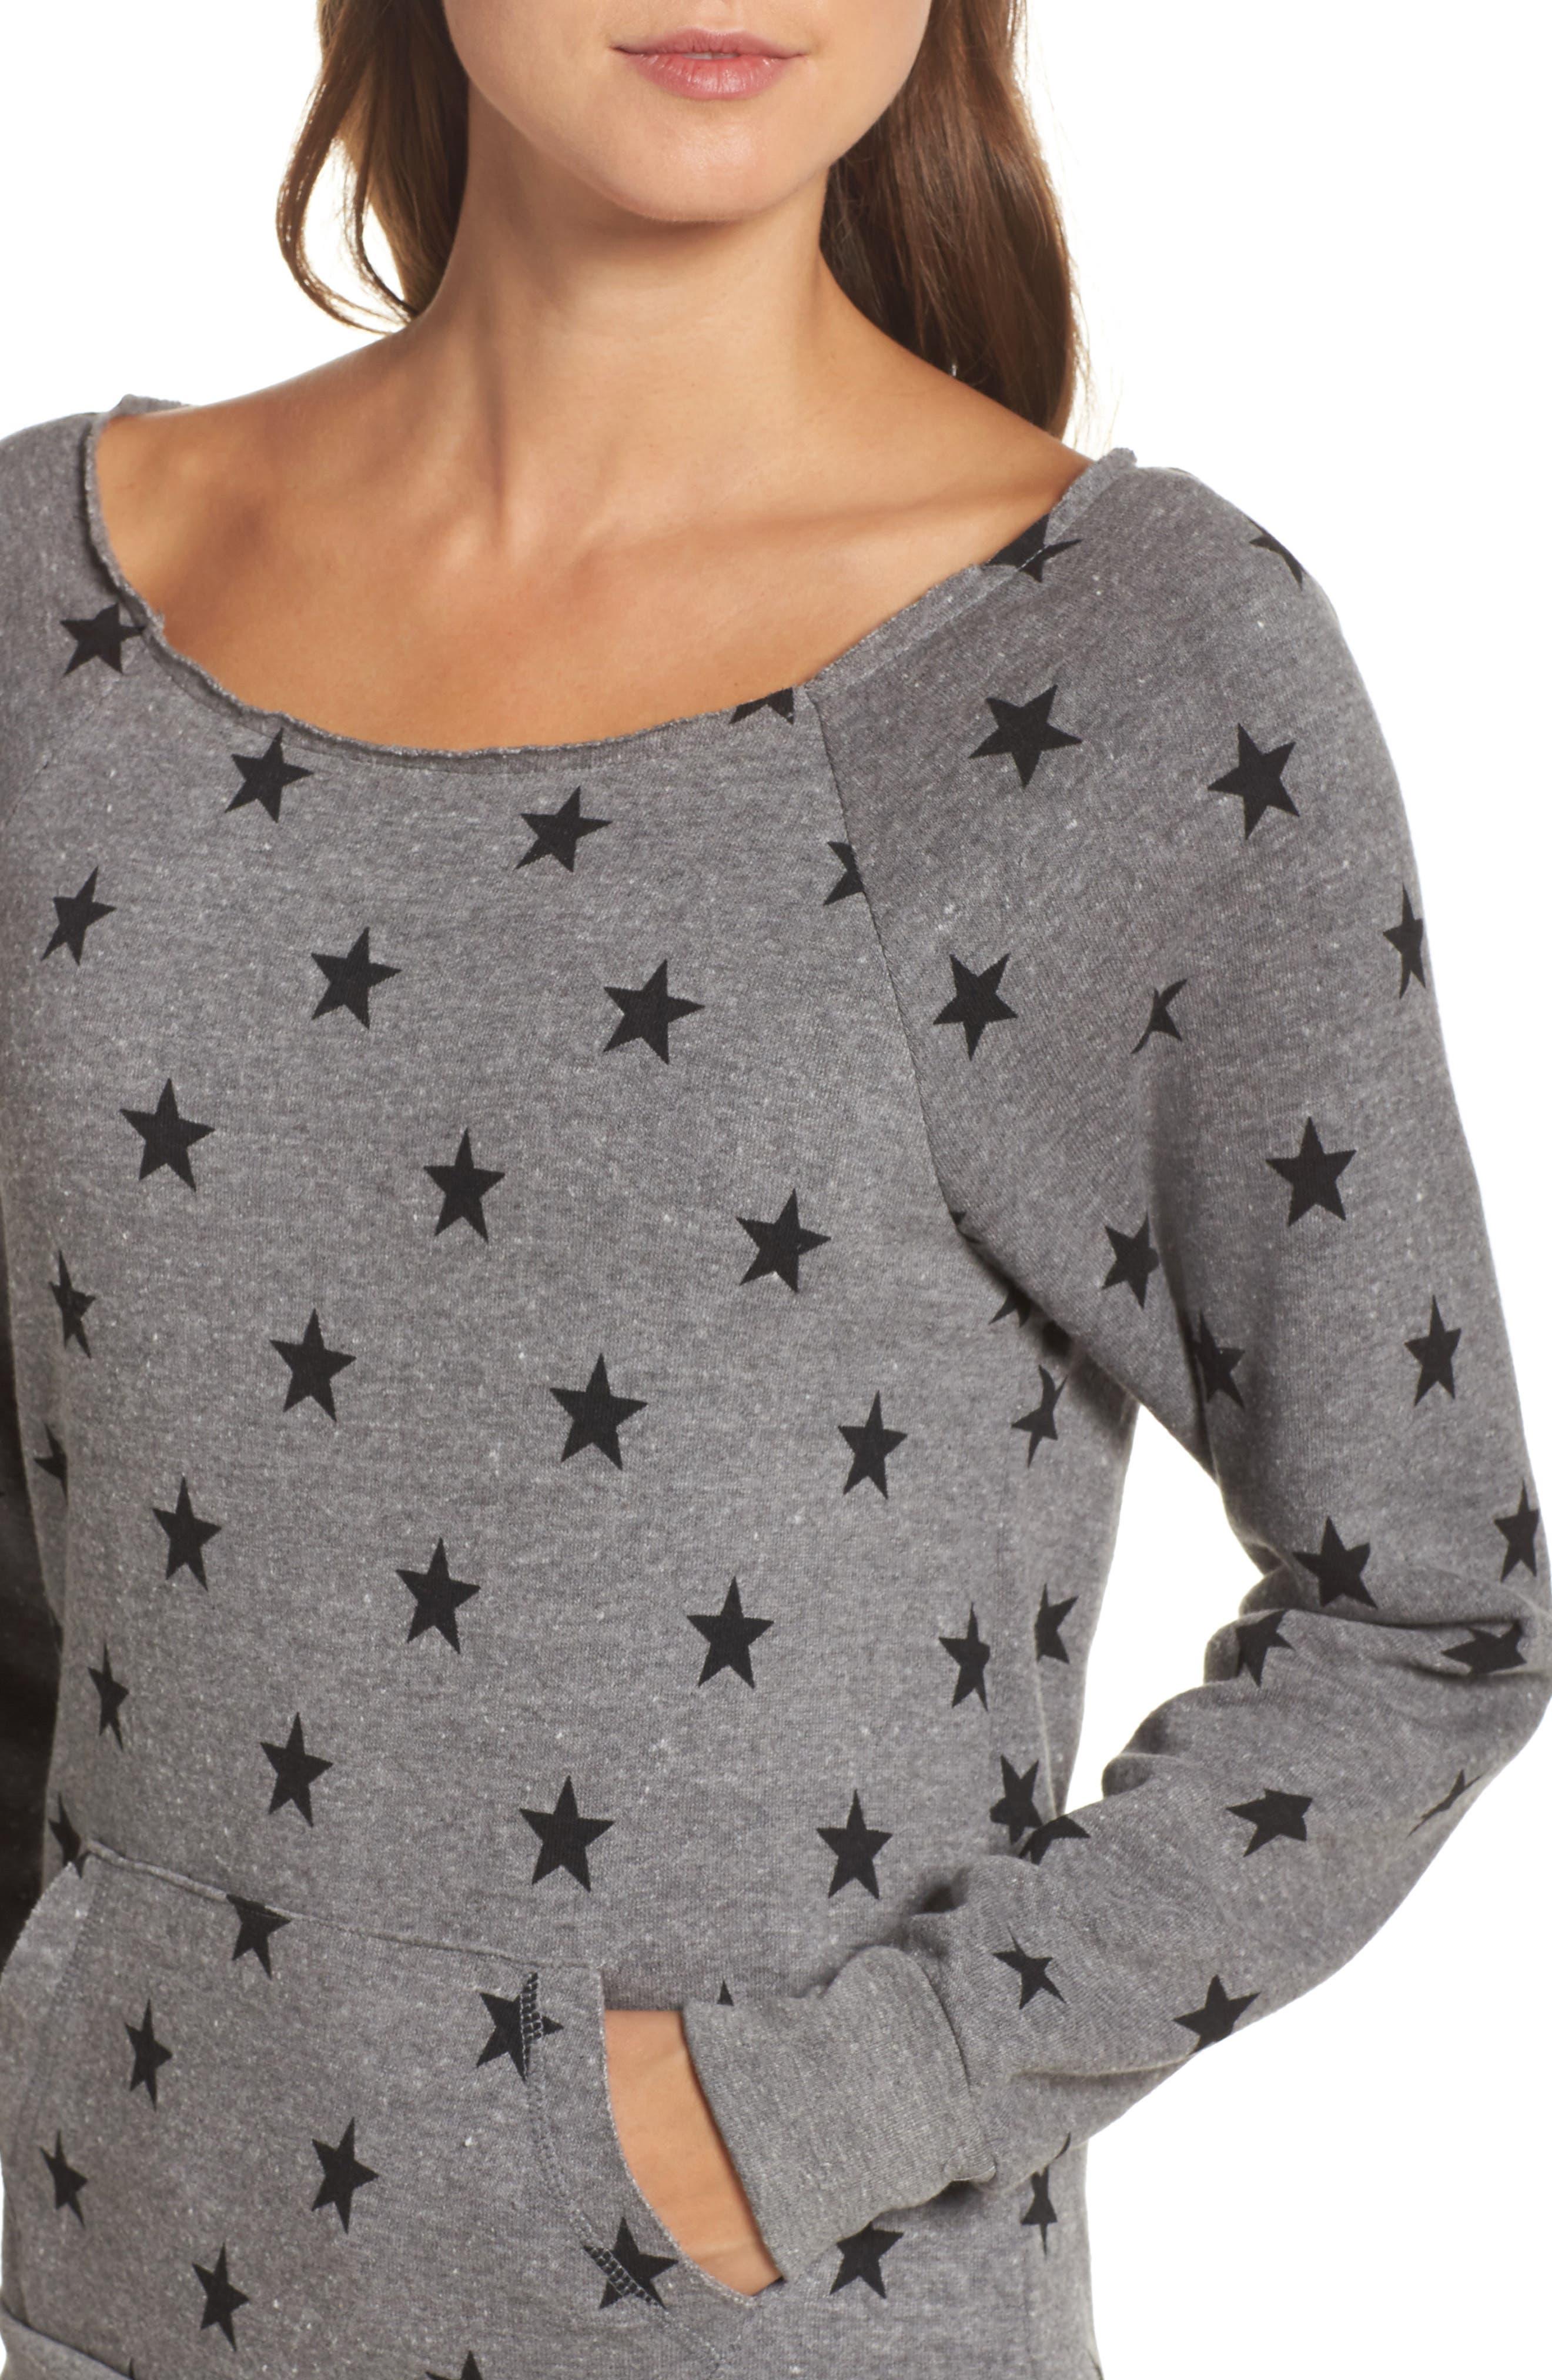 Maniac Camo Fleece Sweatshirt,                             Alternate thumbnail 4, color,                             089